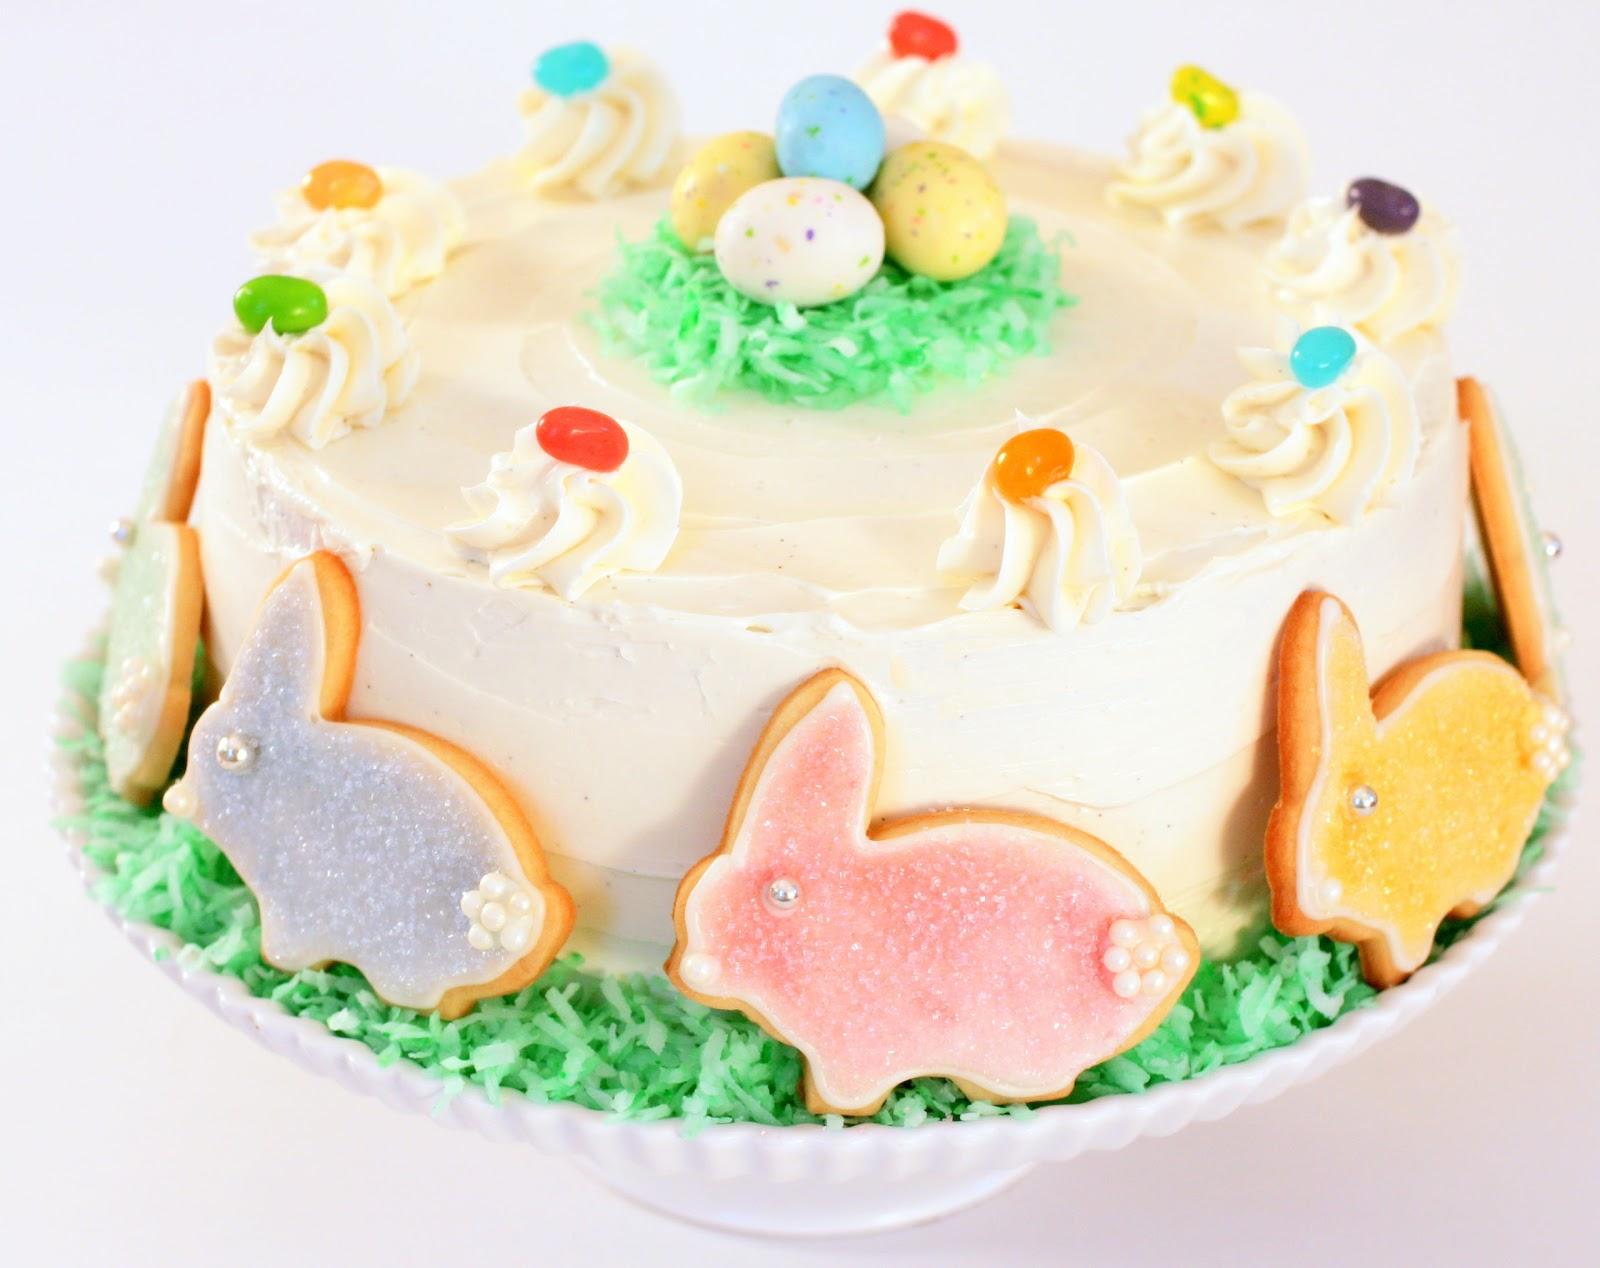 Tish Boyle Sweet Dreams: Chocolate Easter Cake with Vanilla Malt ...